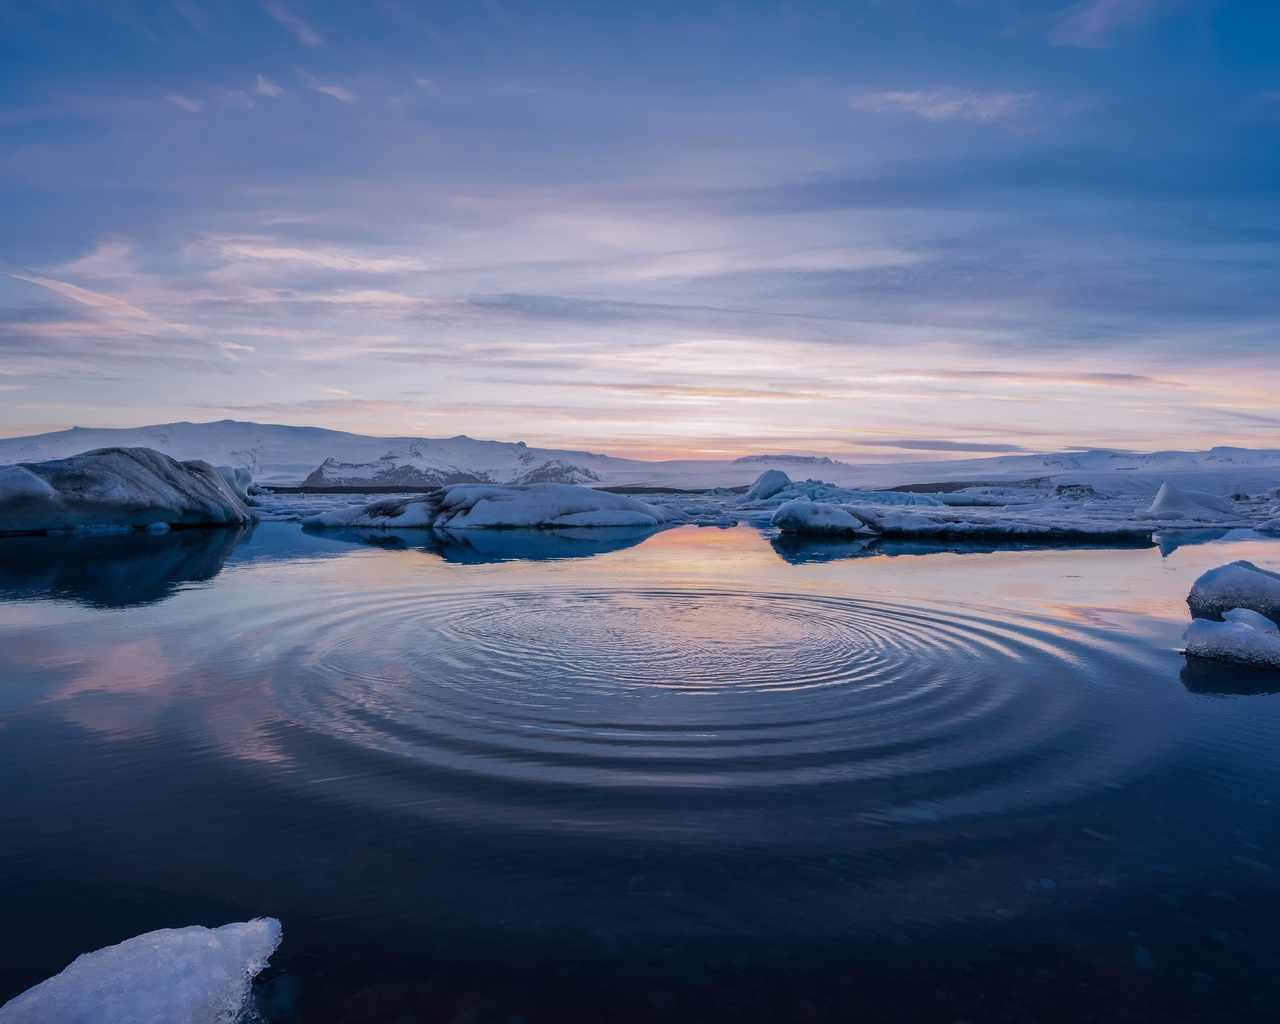 горизонт, вода, круги, снег